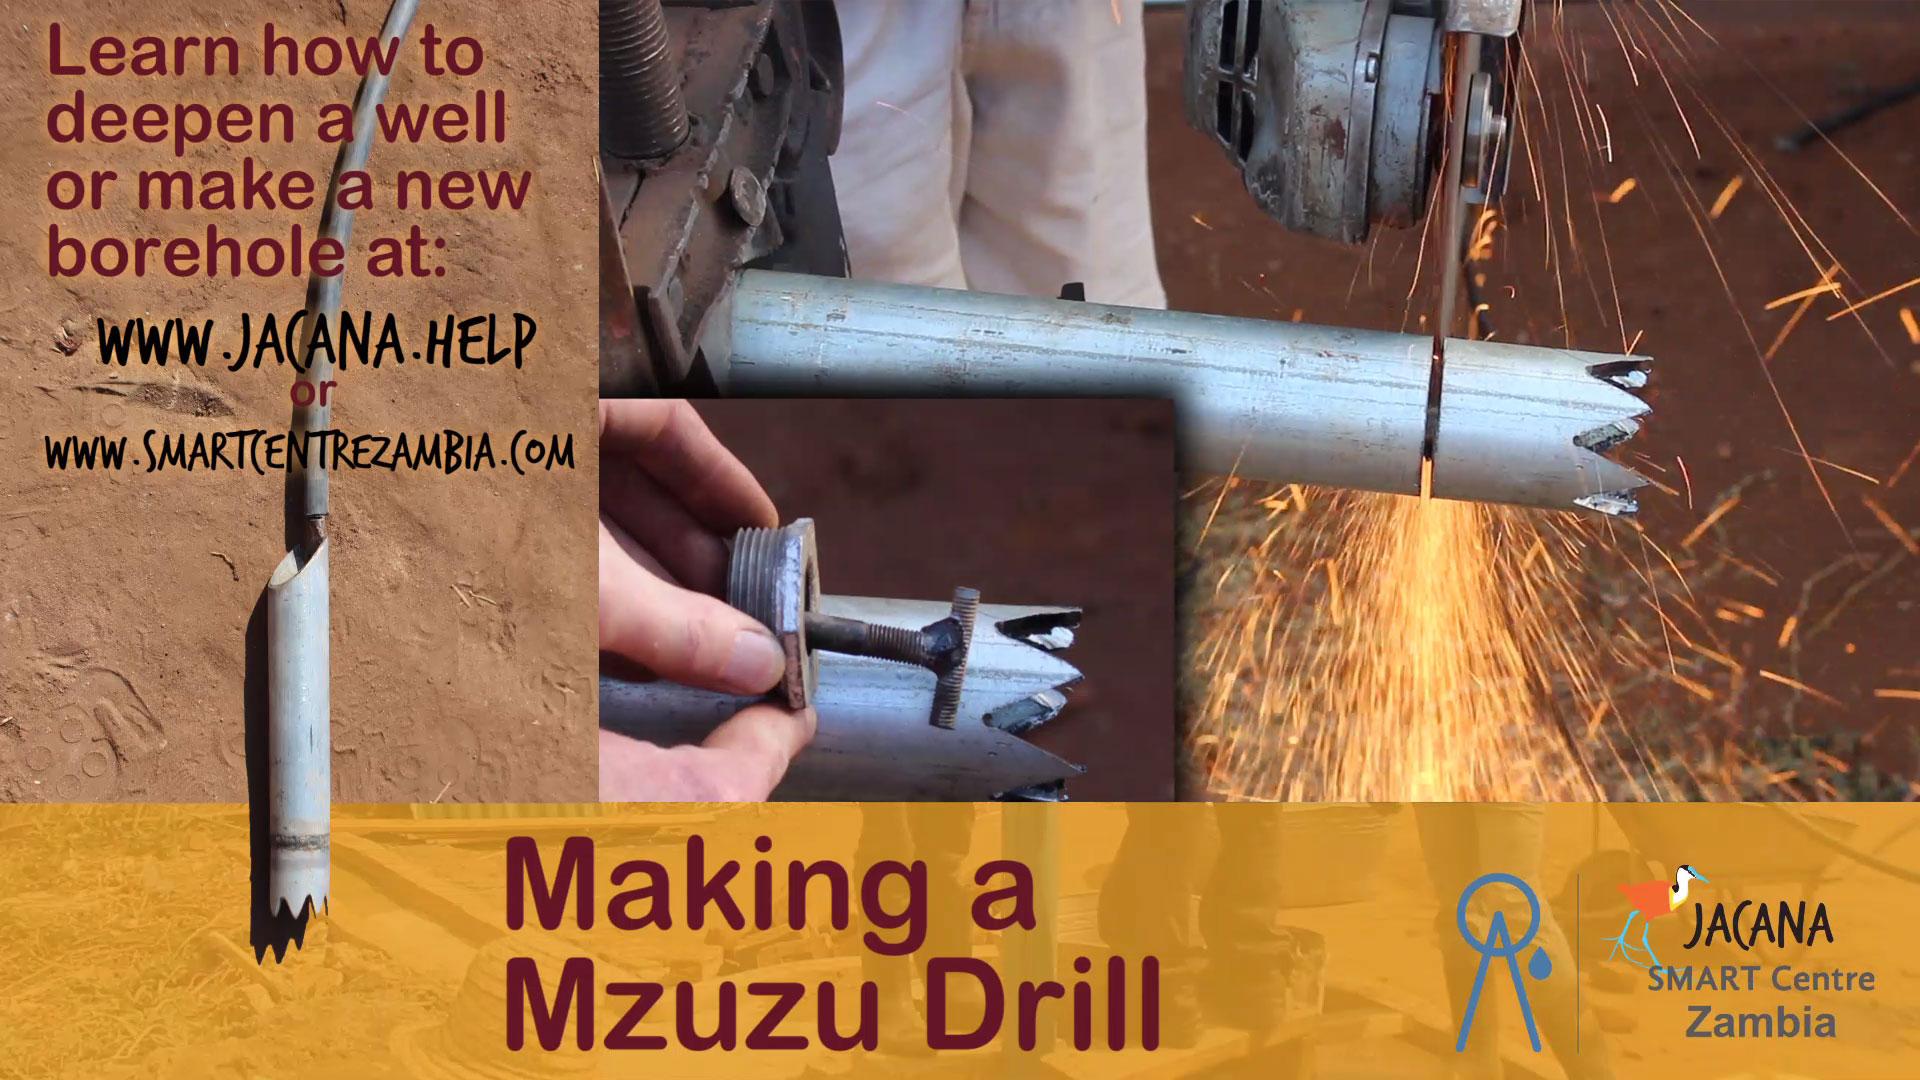 Making a Mzuzu drill